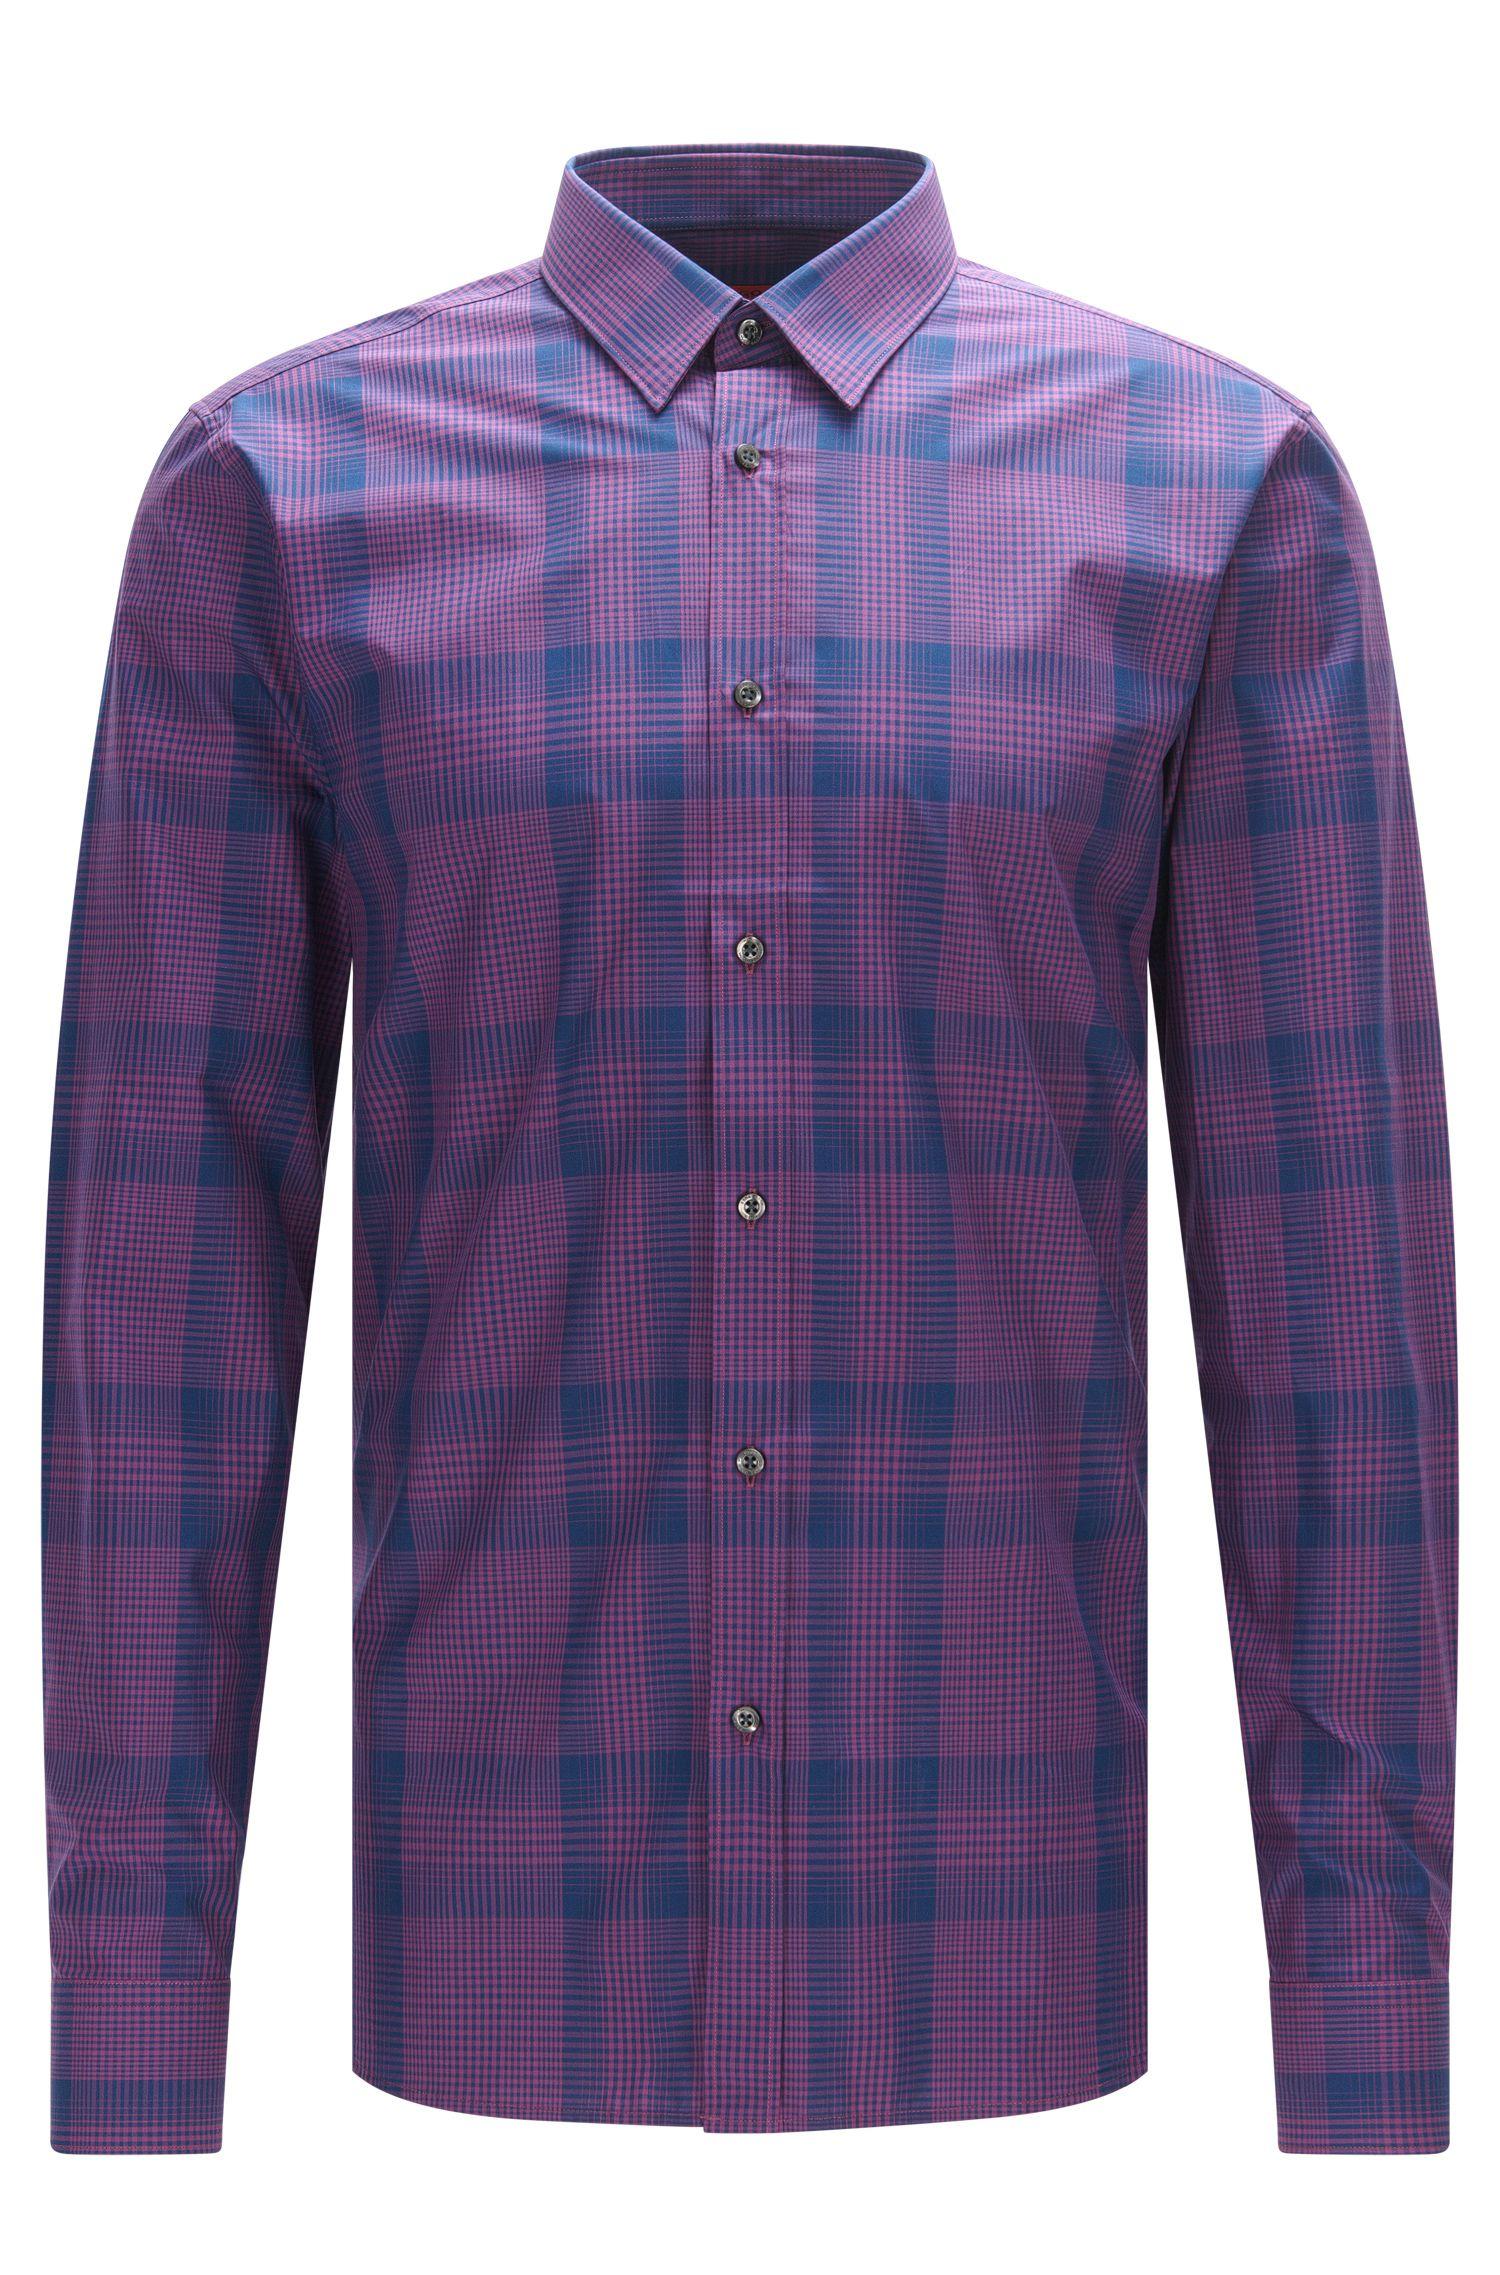 'Elisha'   Extra Slim Fit, Cotton Button Down Shirt